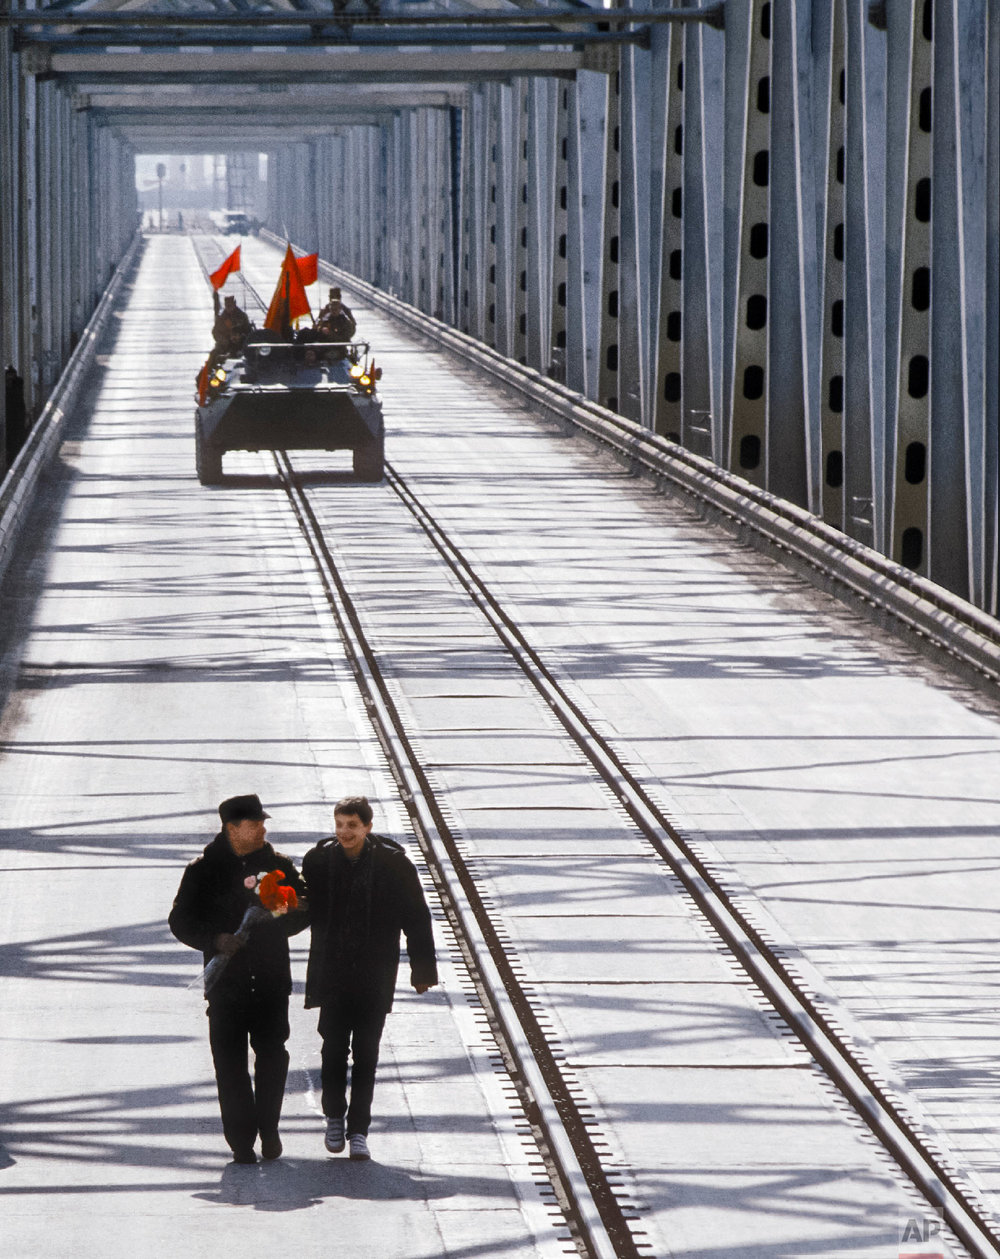 Lt. Gen. Boris Gromov, left, with his son Maxim, walk across a bridge over the Amy Darya River, at Termez, Uzbekistan on Feb. 15, 1989. (AP Photo/Vyacheslav Kiselev)